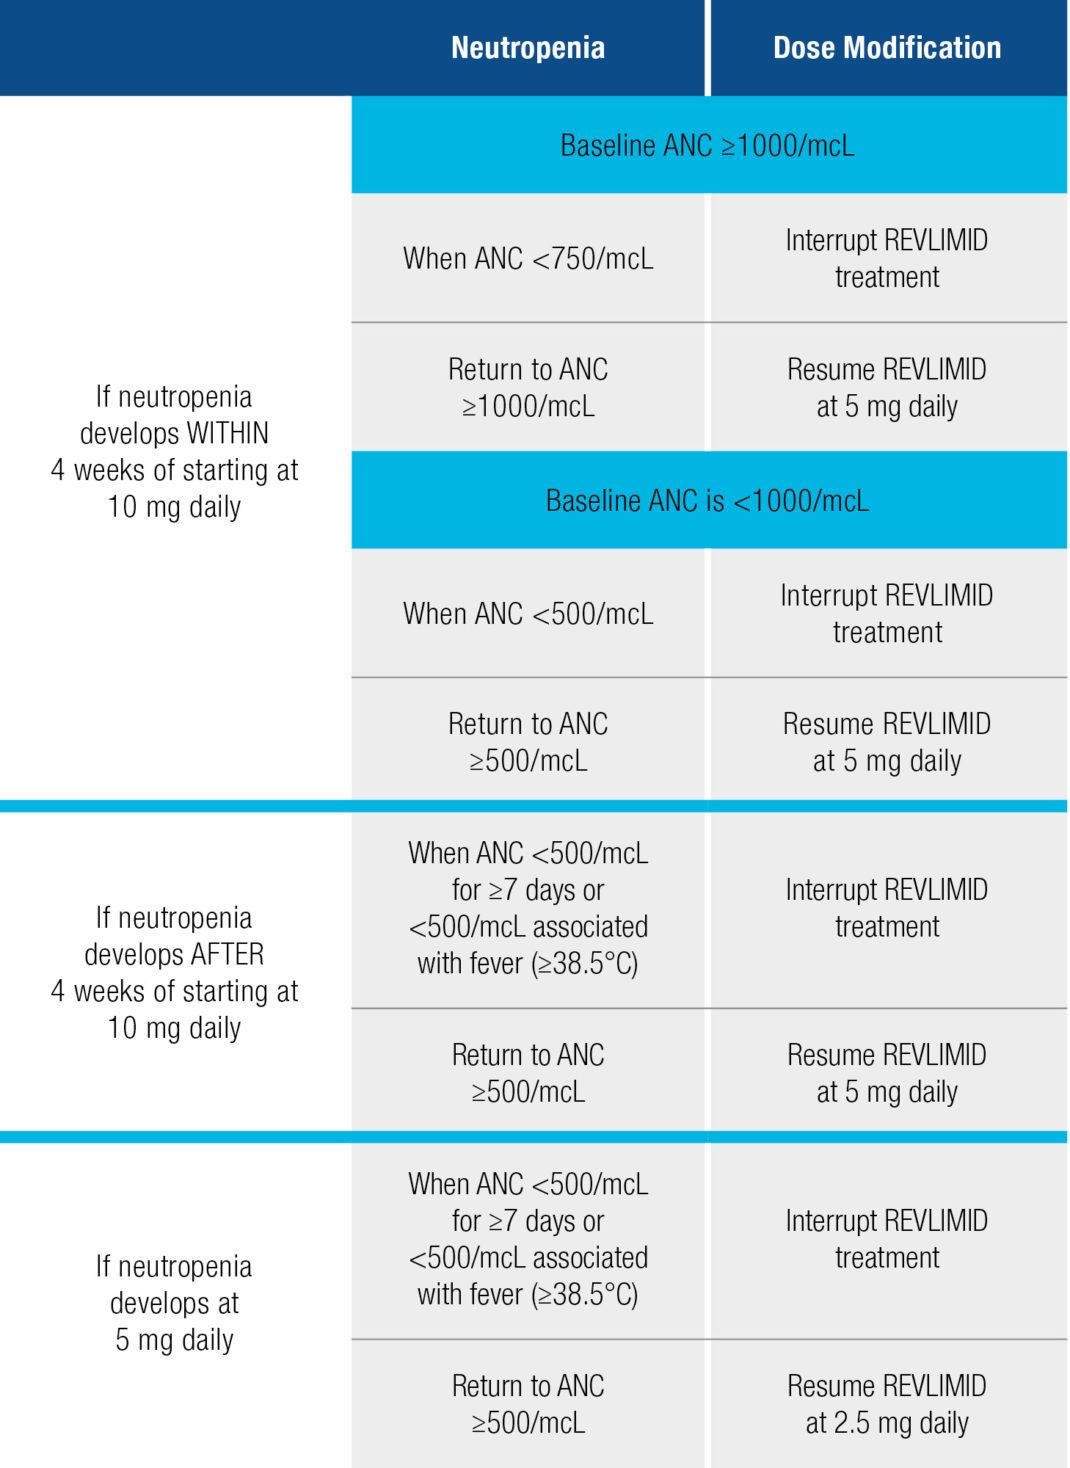 Dose Modifications for Hematologic Toxicities (Neutropenia)